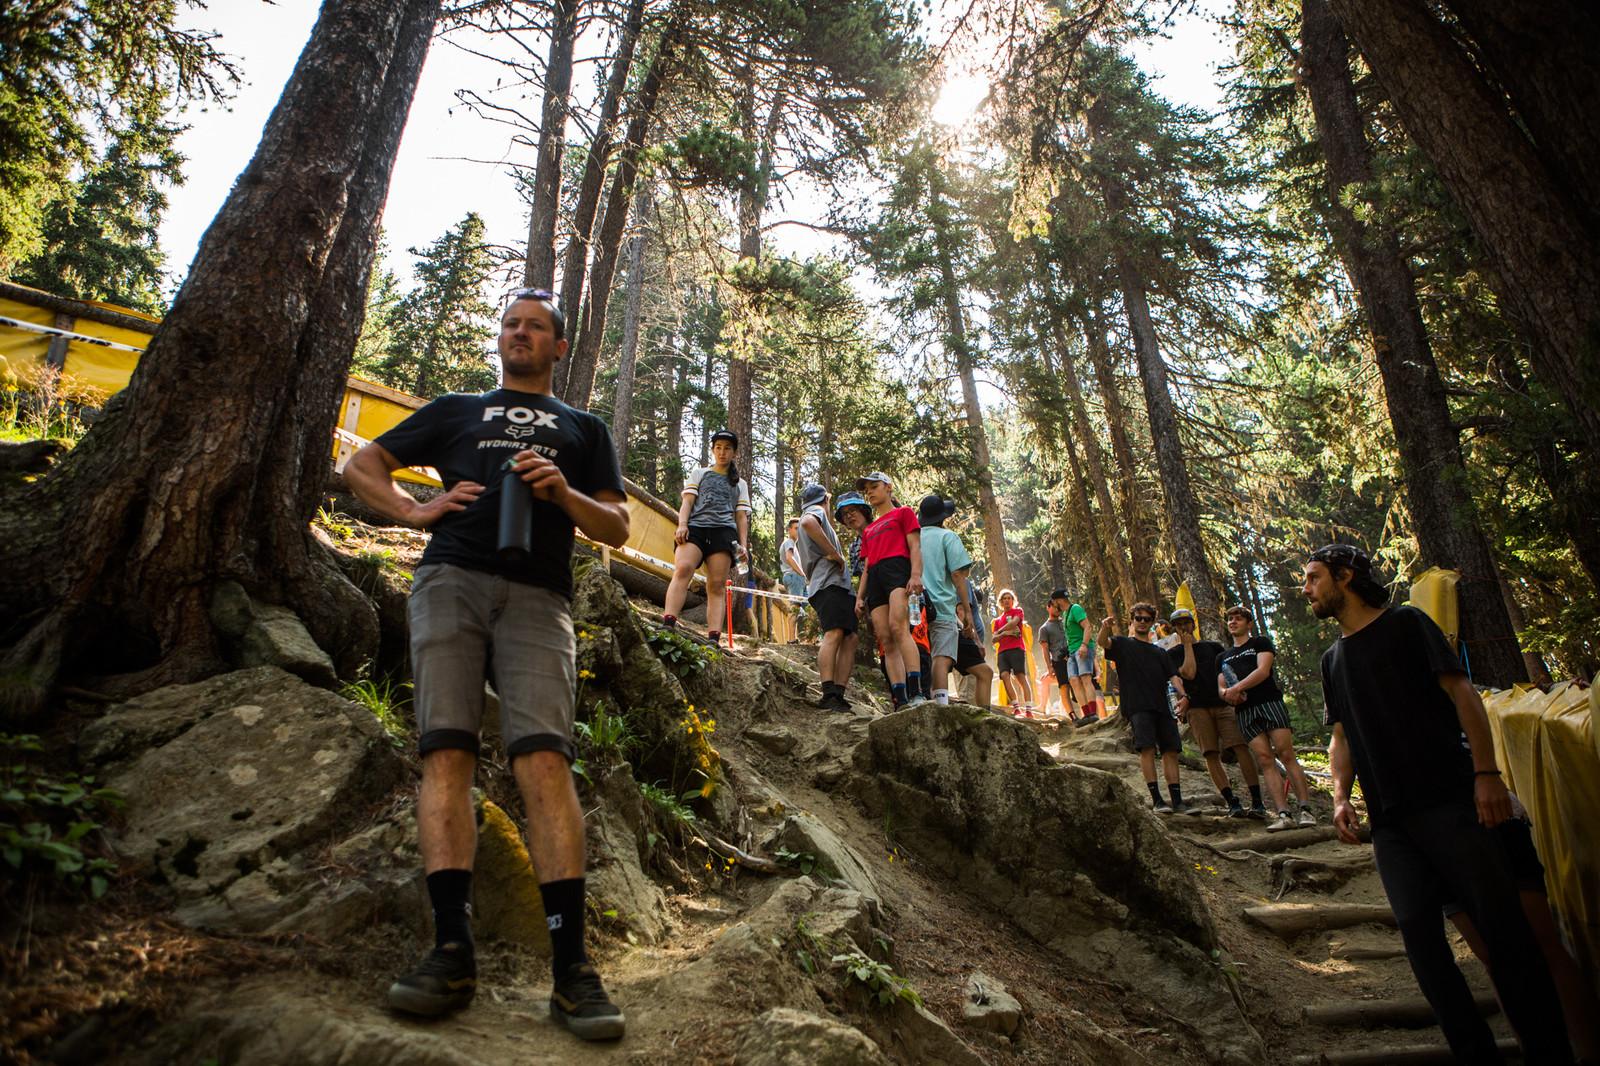 iXS European Downhill Cup, Pila - Not For the Faint of Heart - iXS Downhill Cup Pila - Race Gallery - Mountain Biking Pictures - Vital MTB